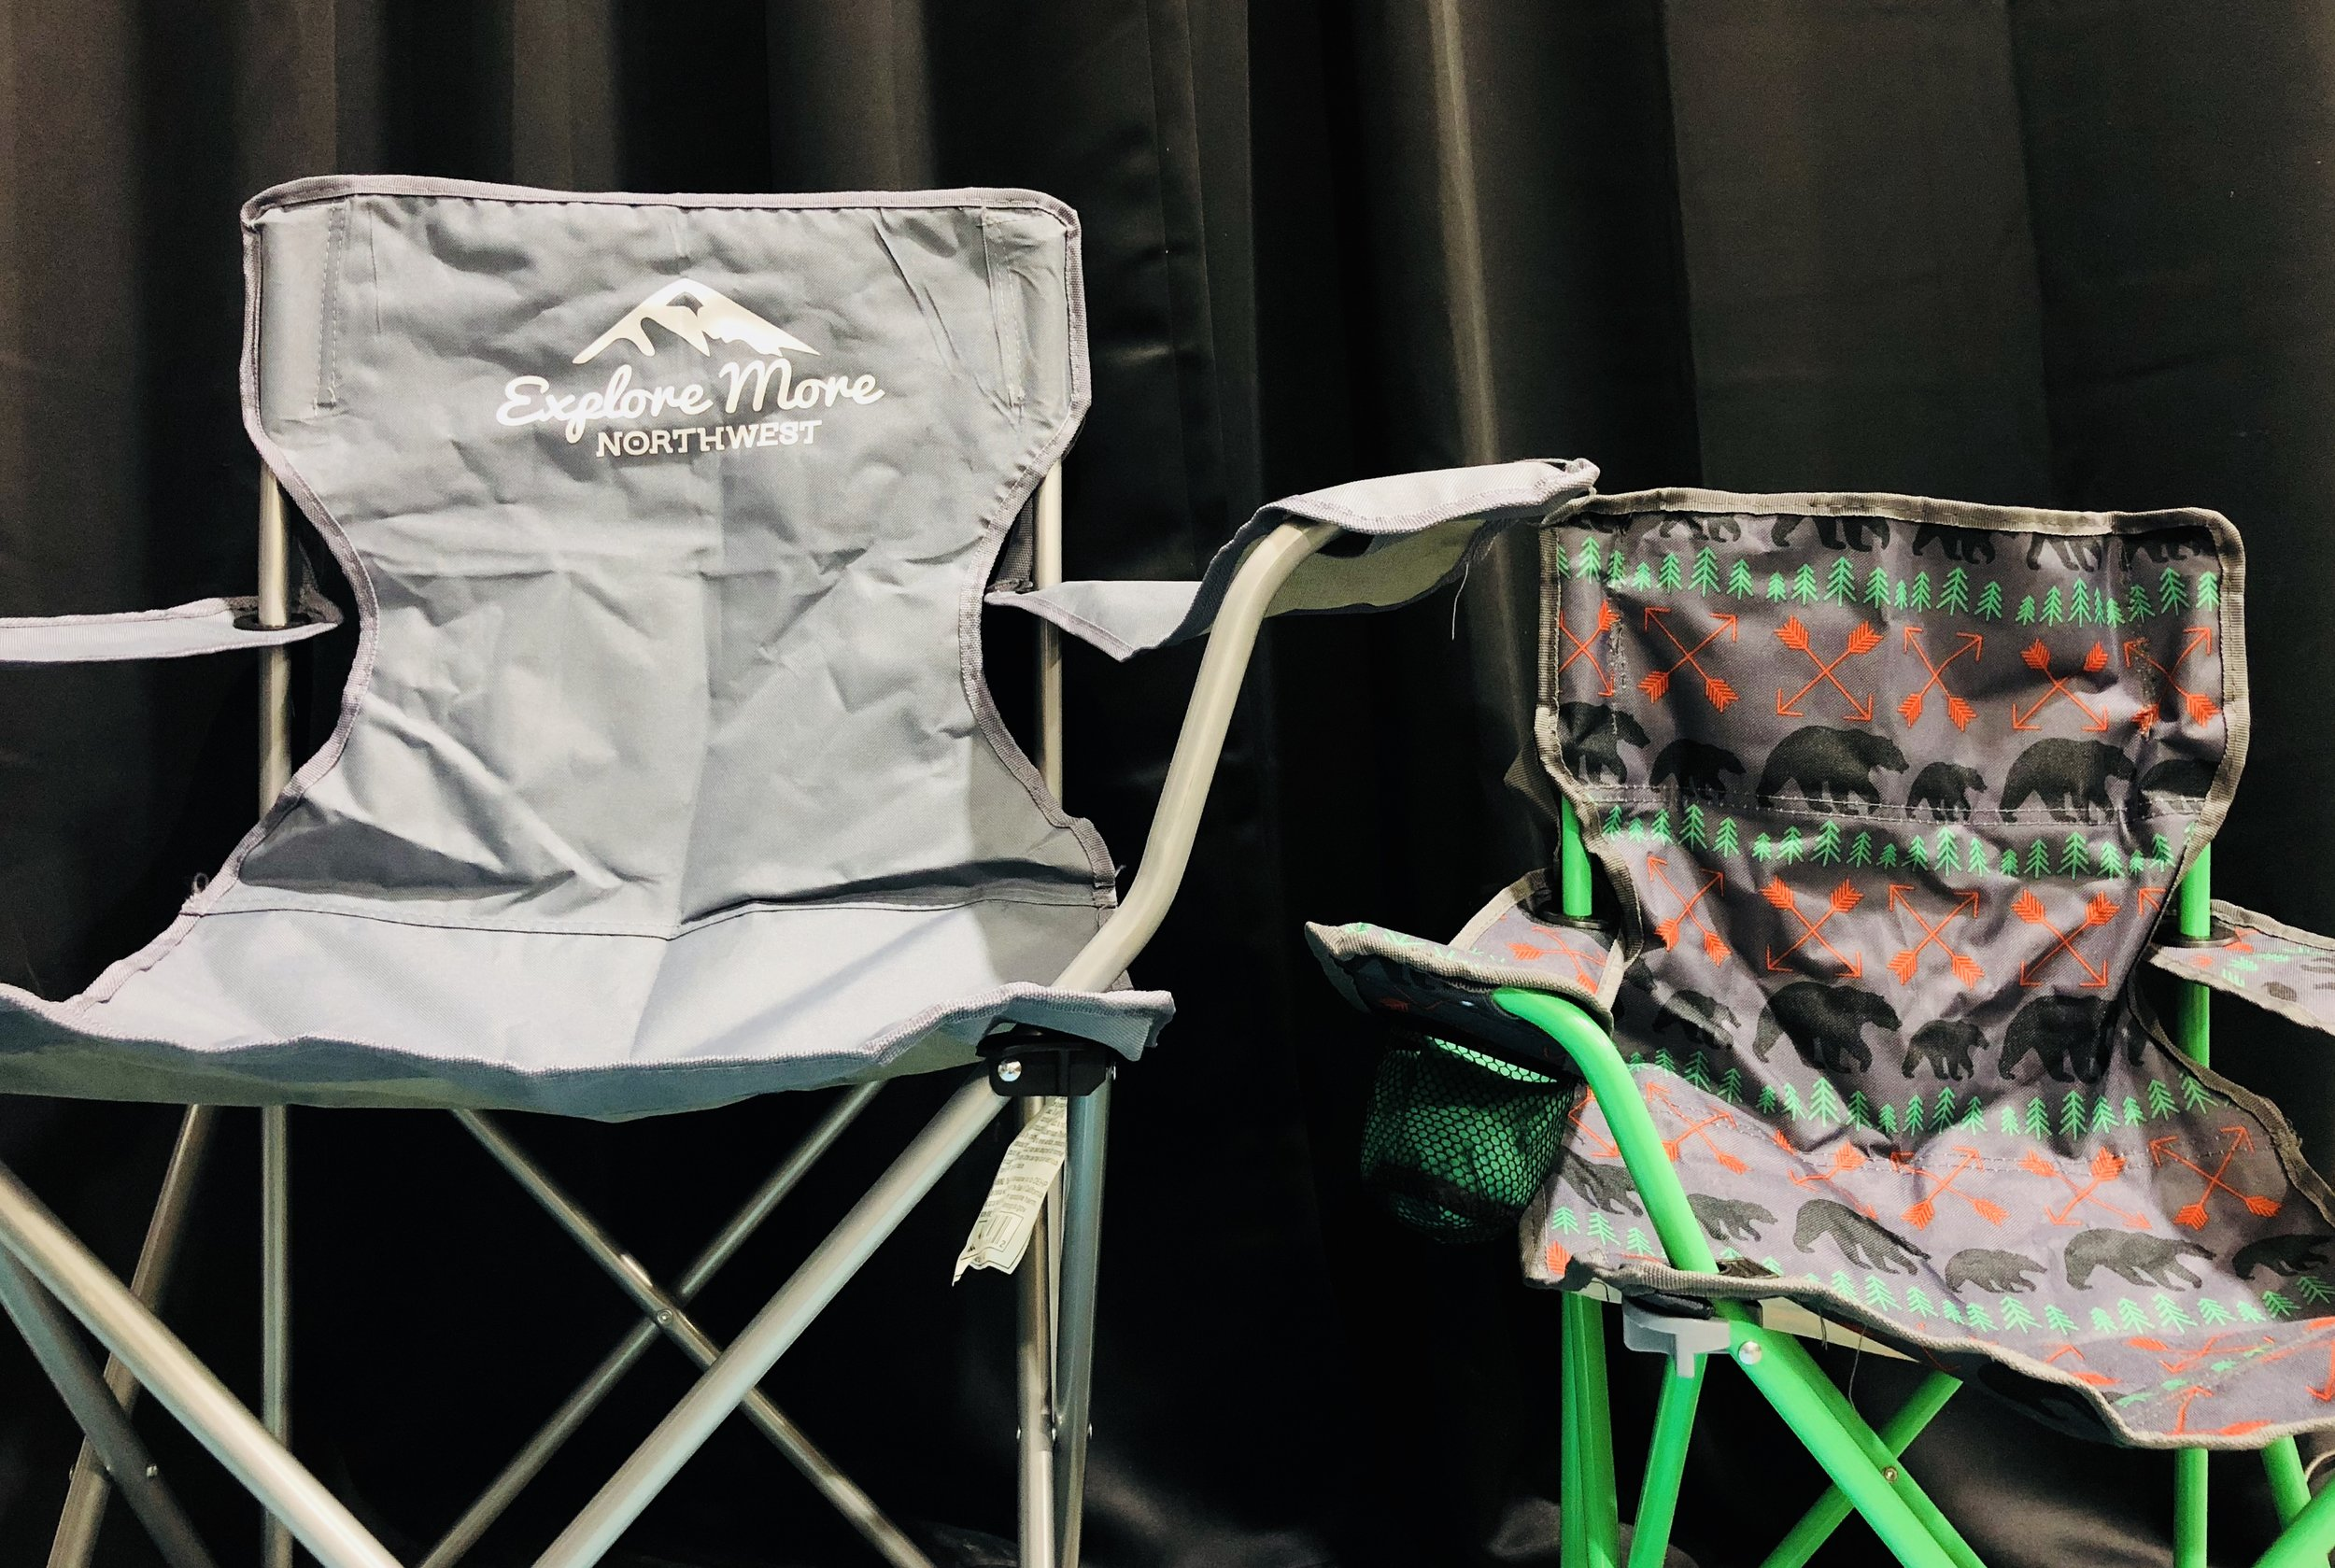 Chair Rentals - Adult Chair: $1.00 per dayKids Chair: $1.00 per day